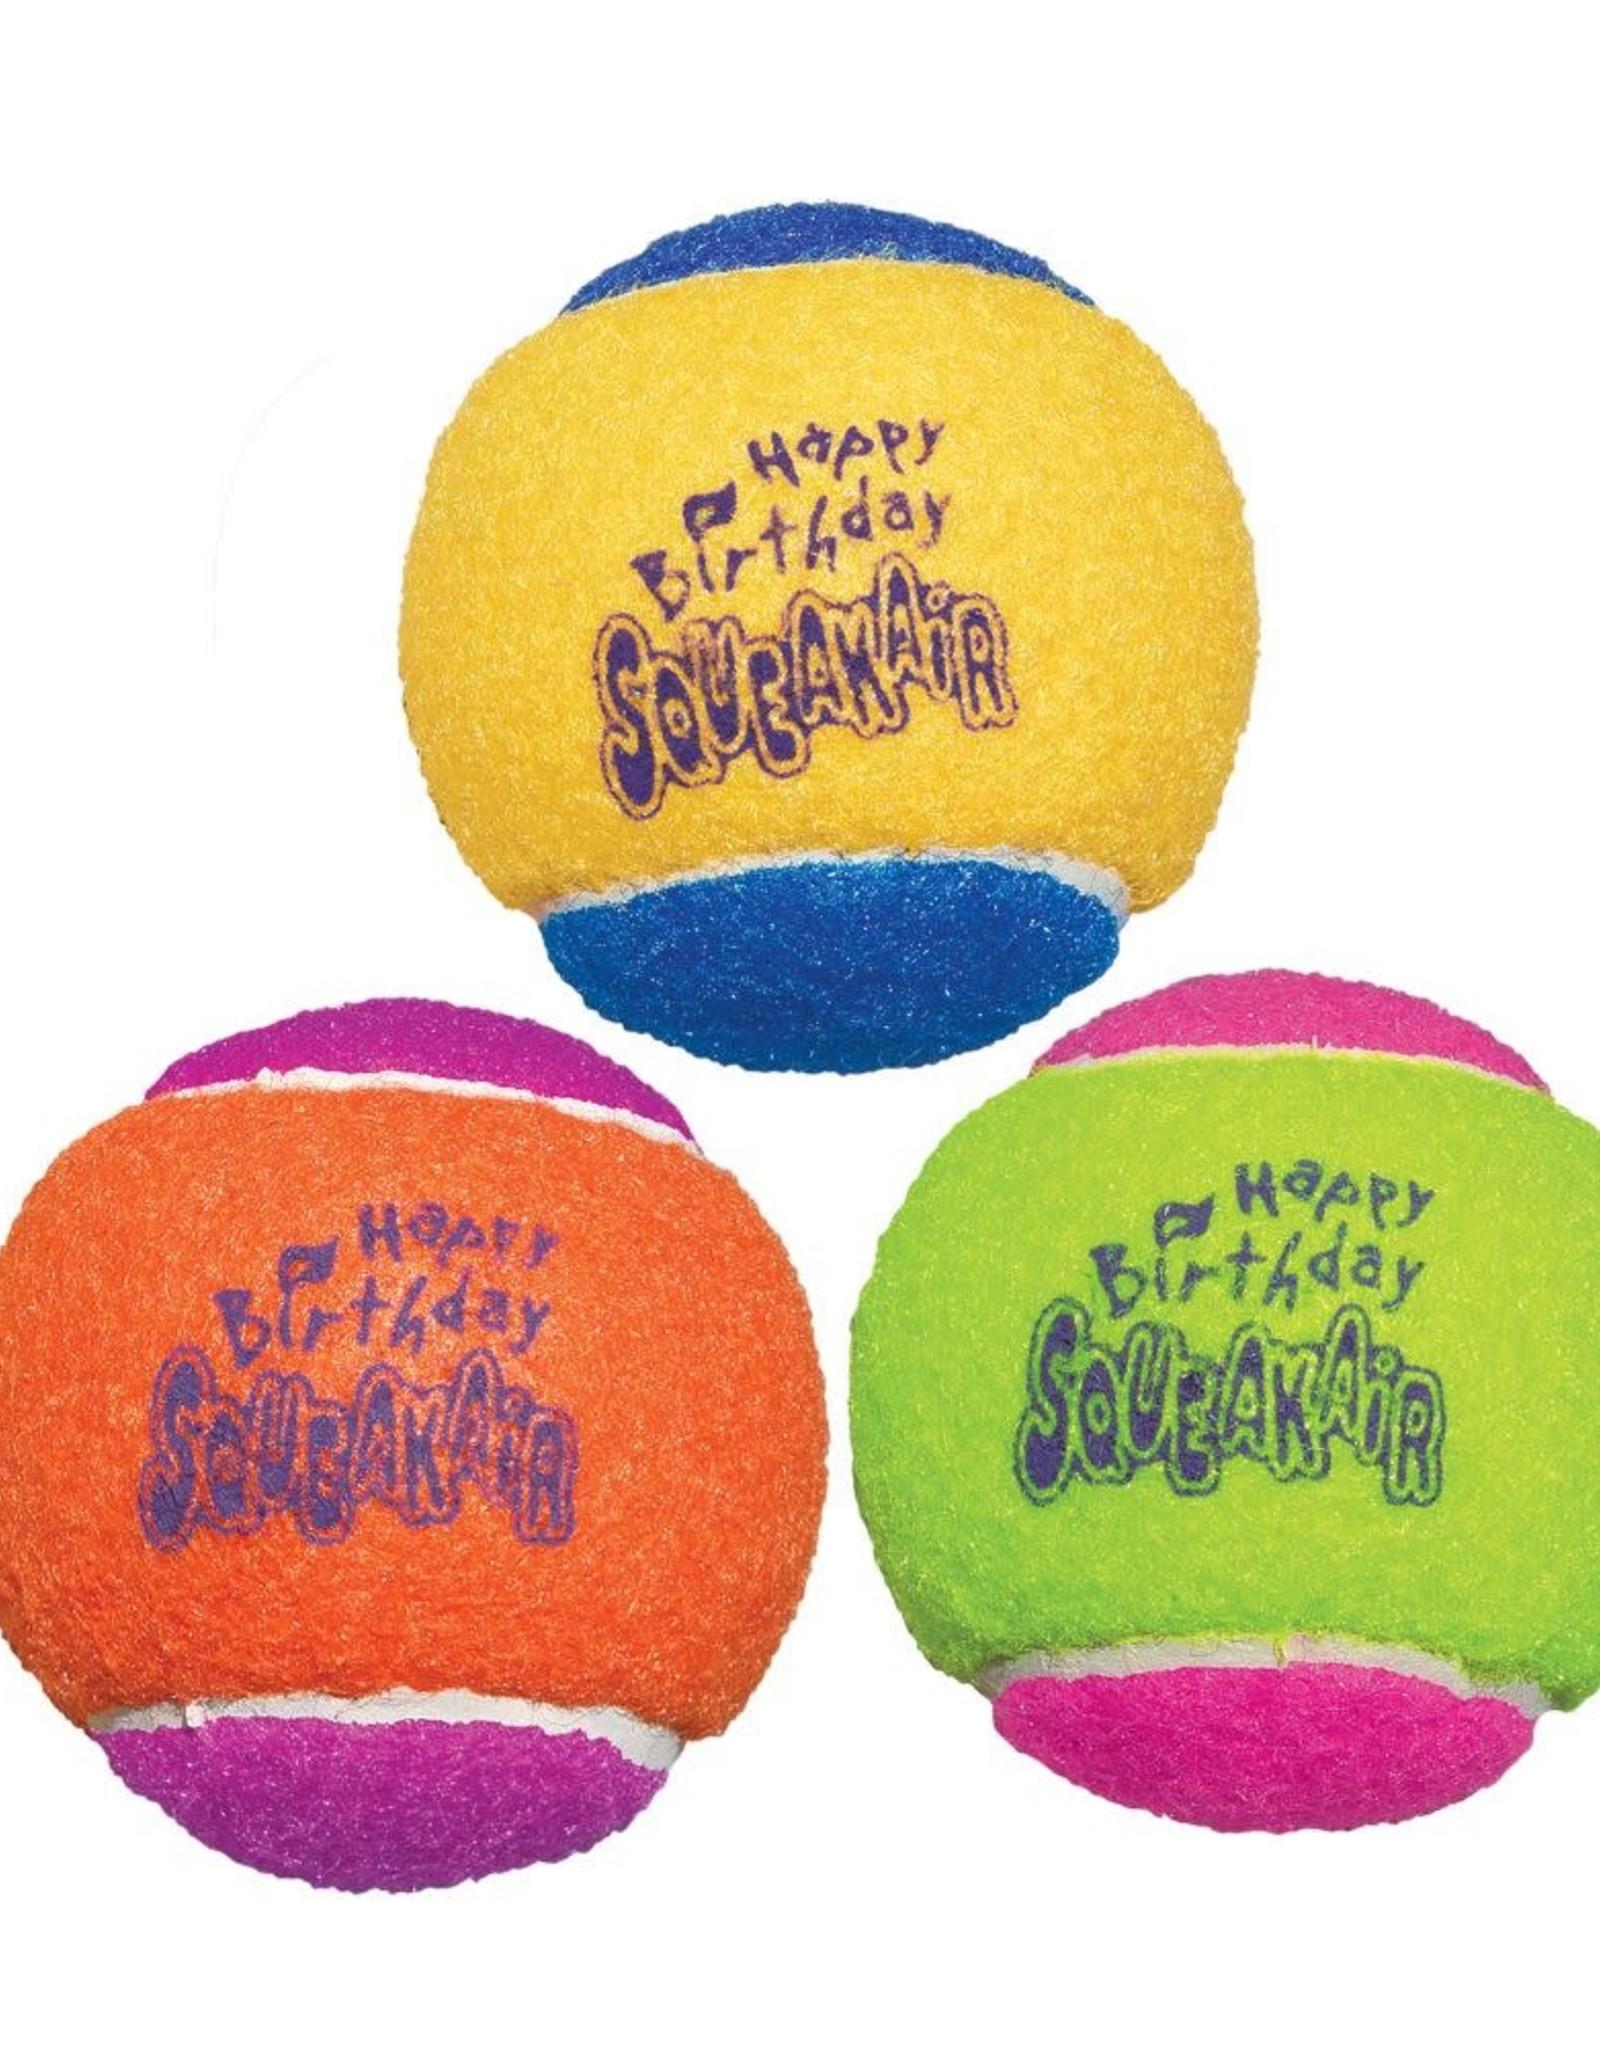 Kong SqueakAir Tennis Ball Birthday